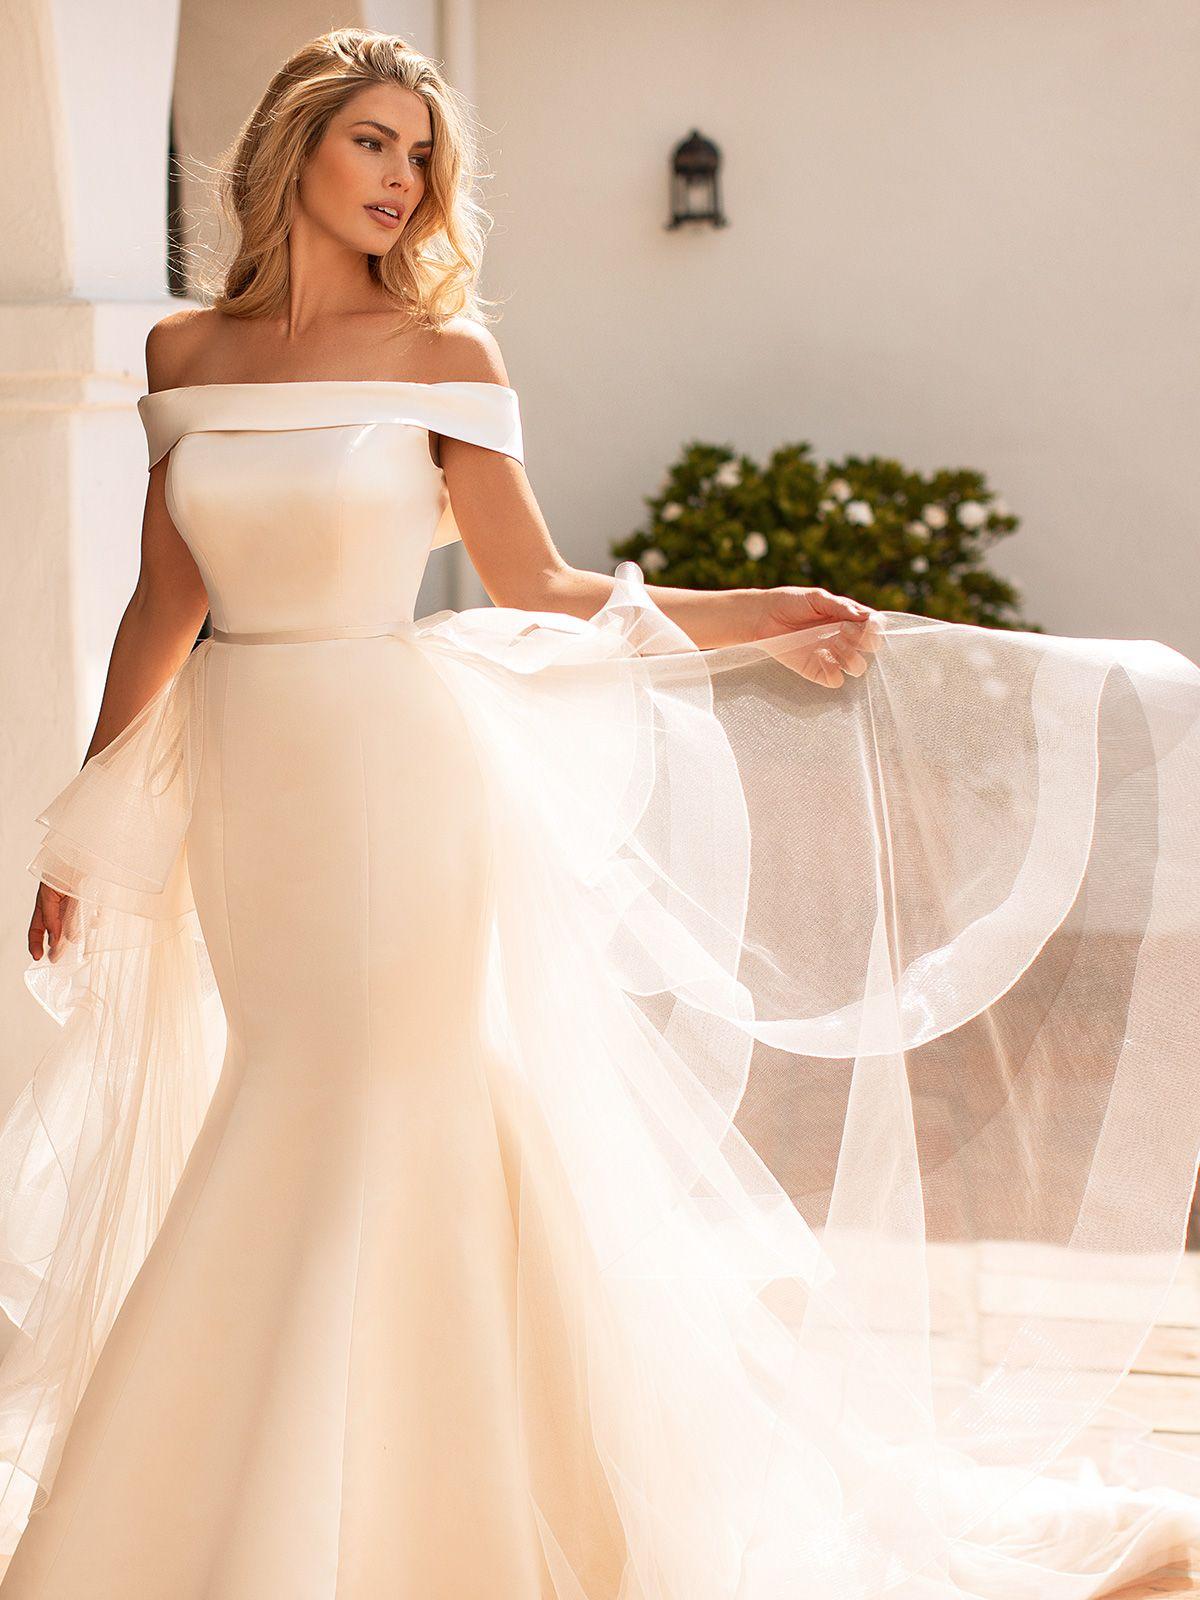 Convertible Satin Fold Over Mermaid Wedding Dress Moonlight Collection J6771 Wedding Dress Long Sleeve Elegant Wedding Dress Satin Mermaid Wedding Dress [ 1600 x 1200 Pixel ]